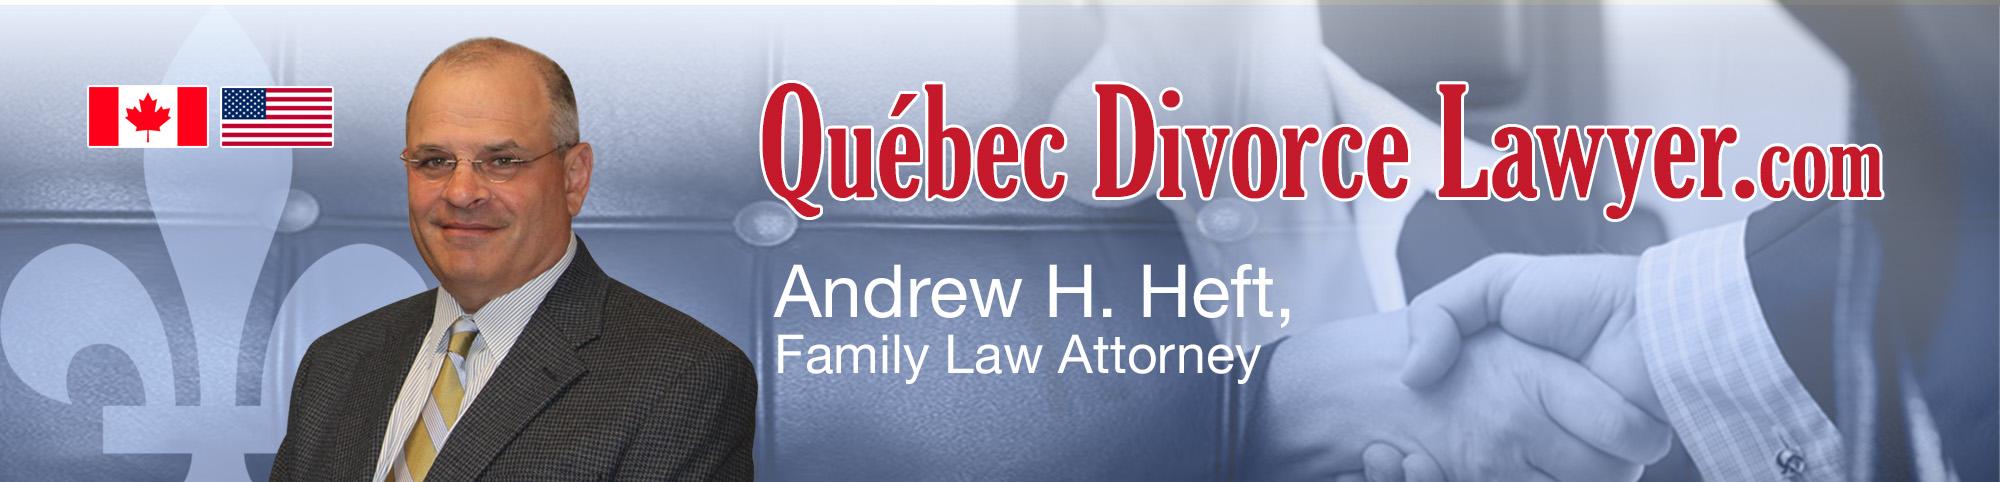 Andrew Heft Family Law Attorney